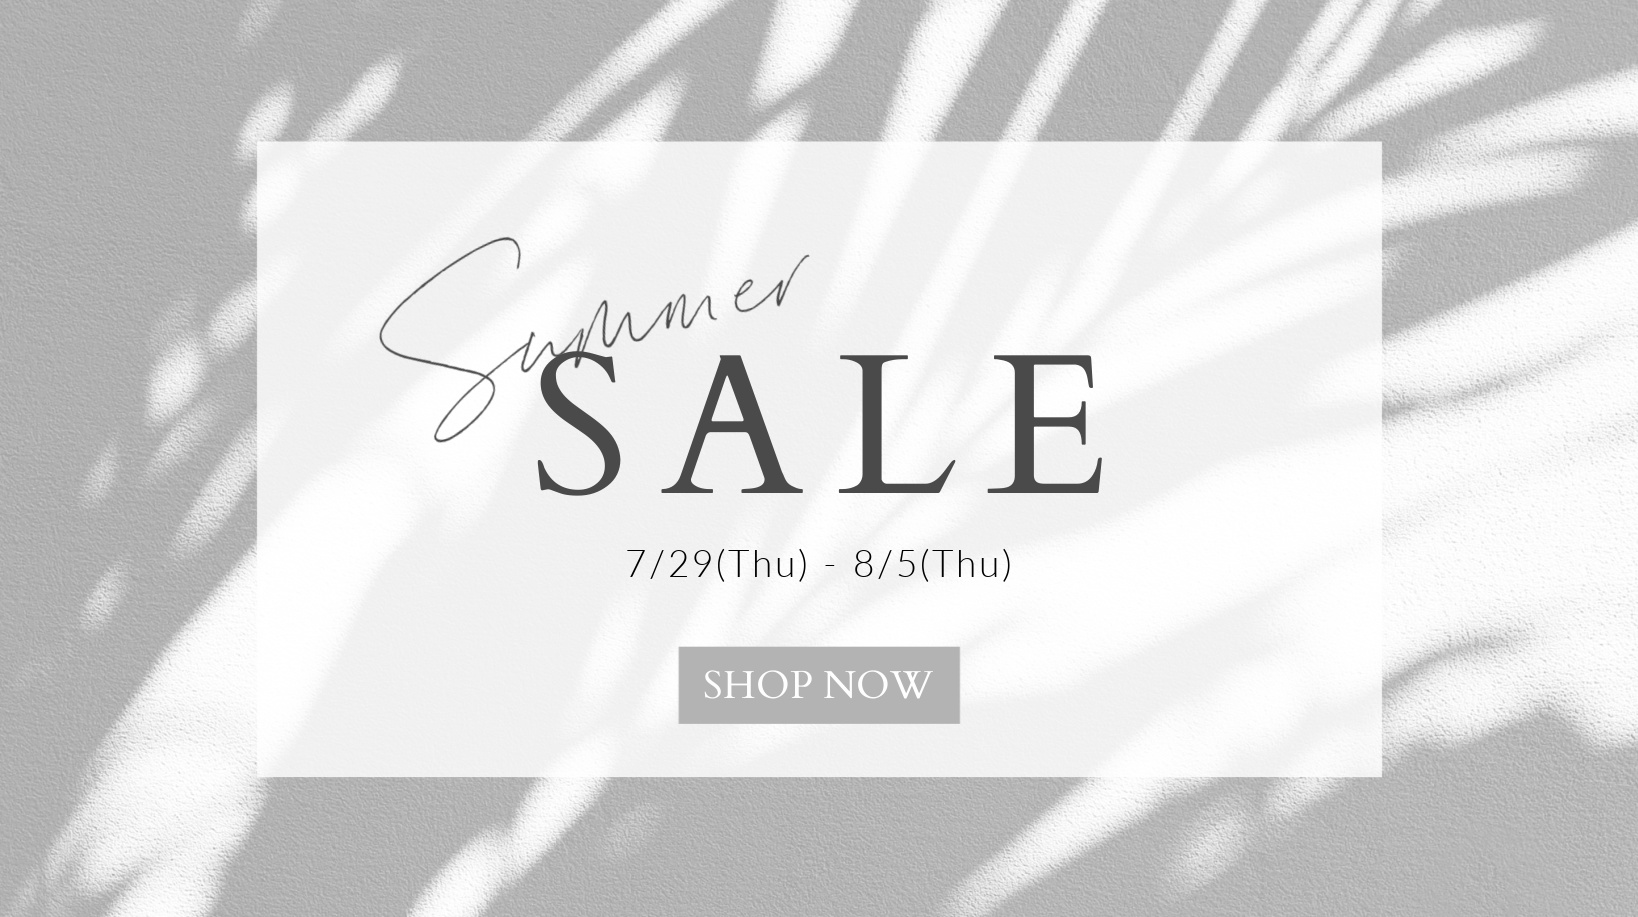 Summer sales Japan 2021